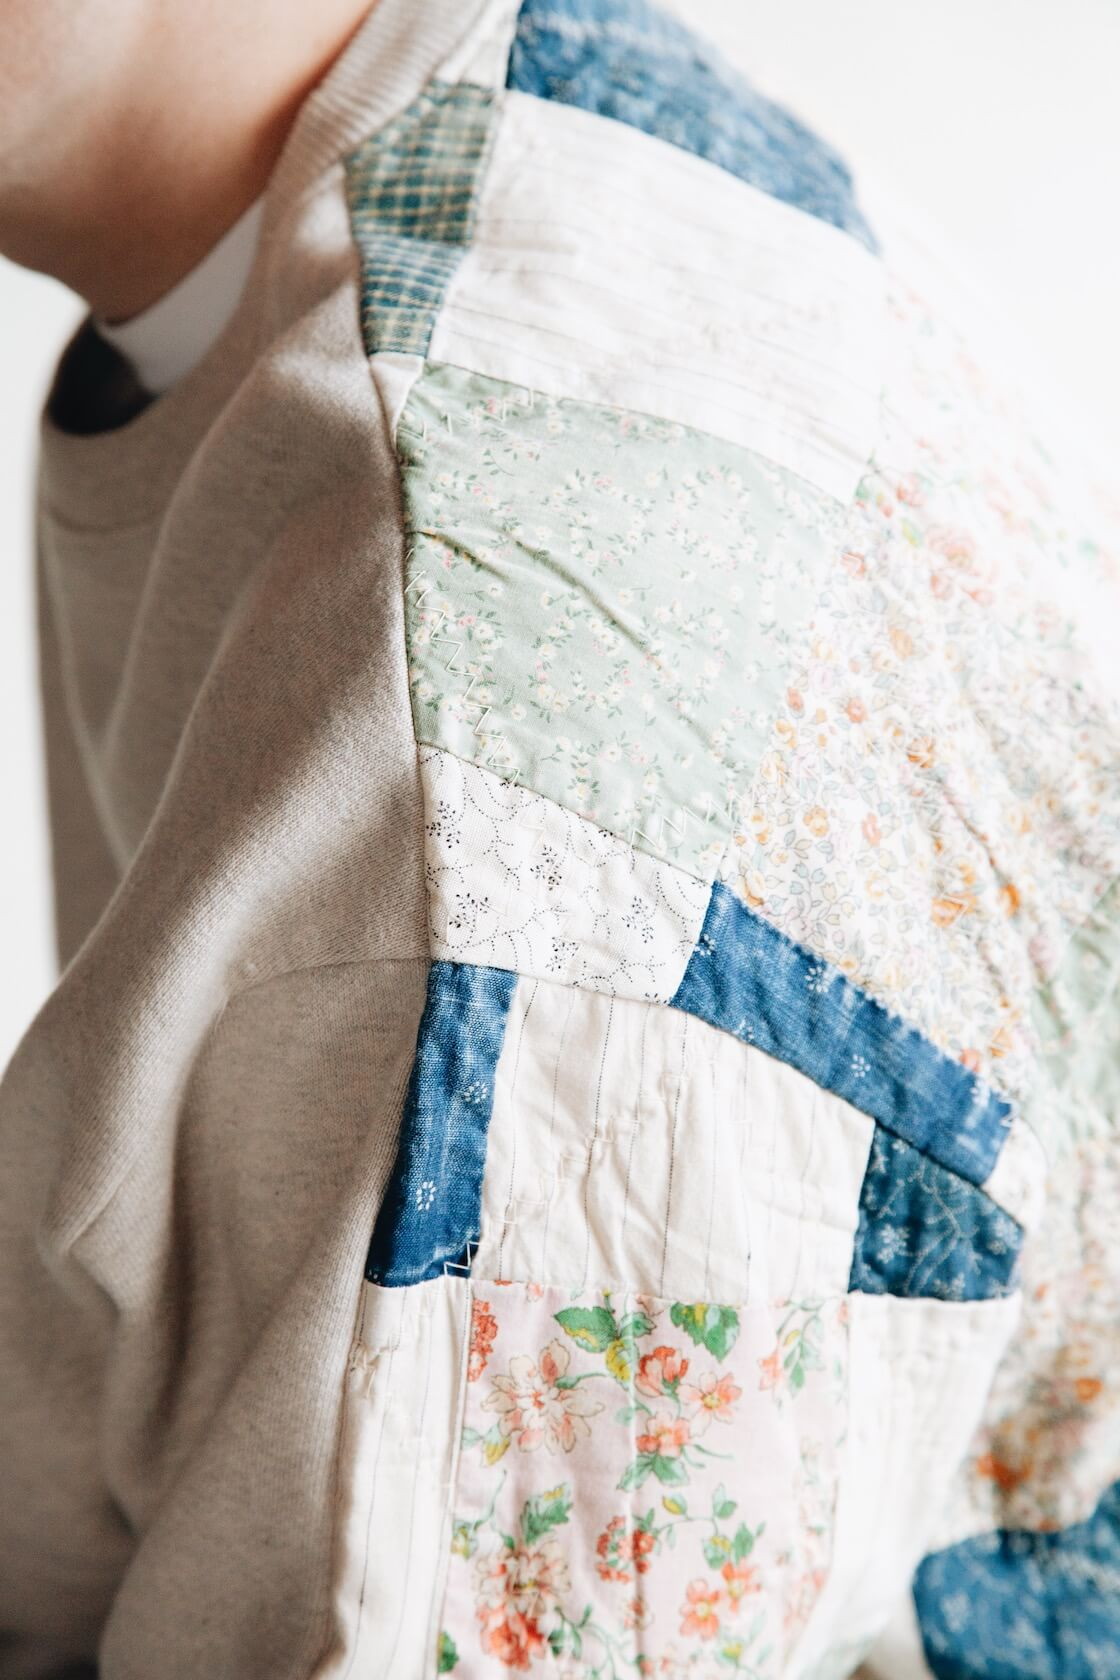 kapital kountry fleecy knit x american quilt country 2 tones big sweatshirt on body